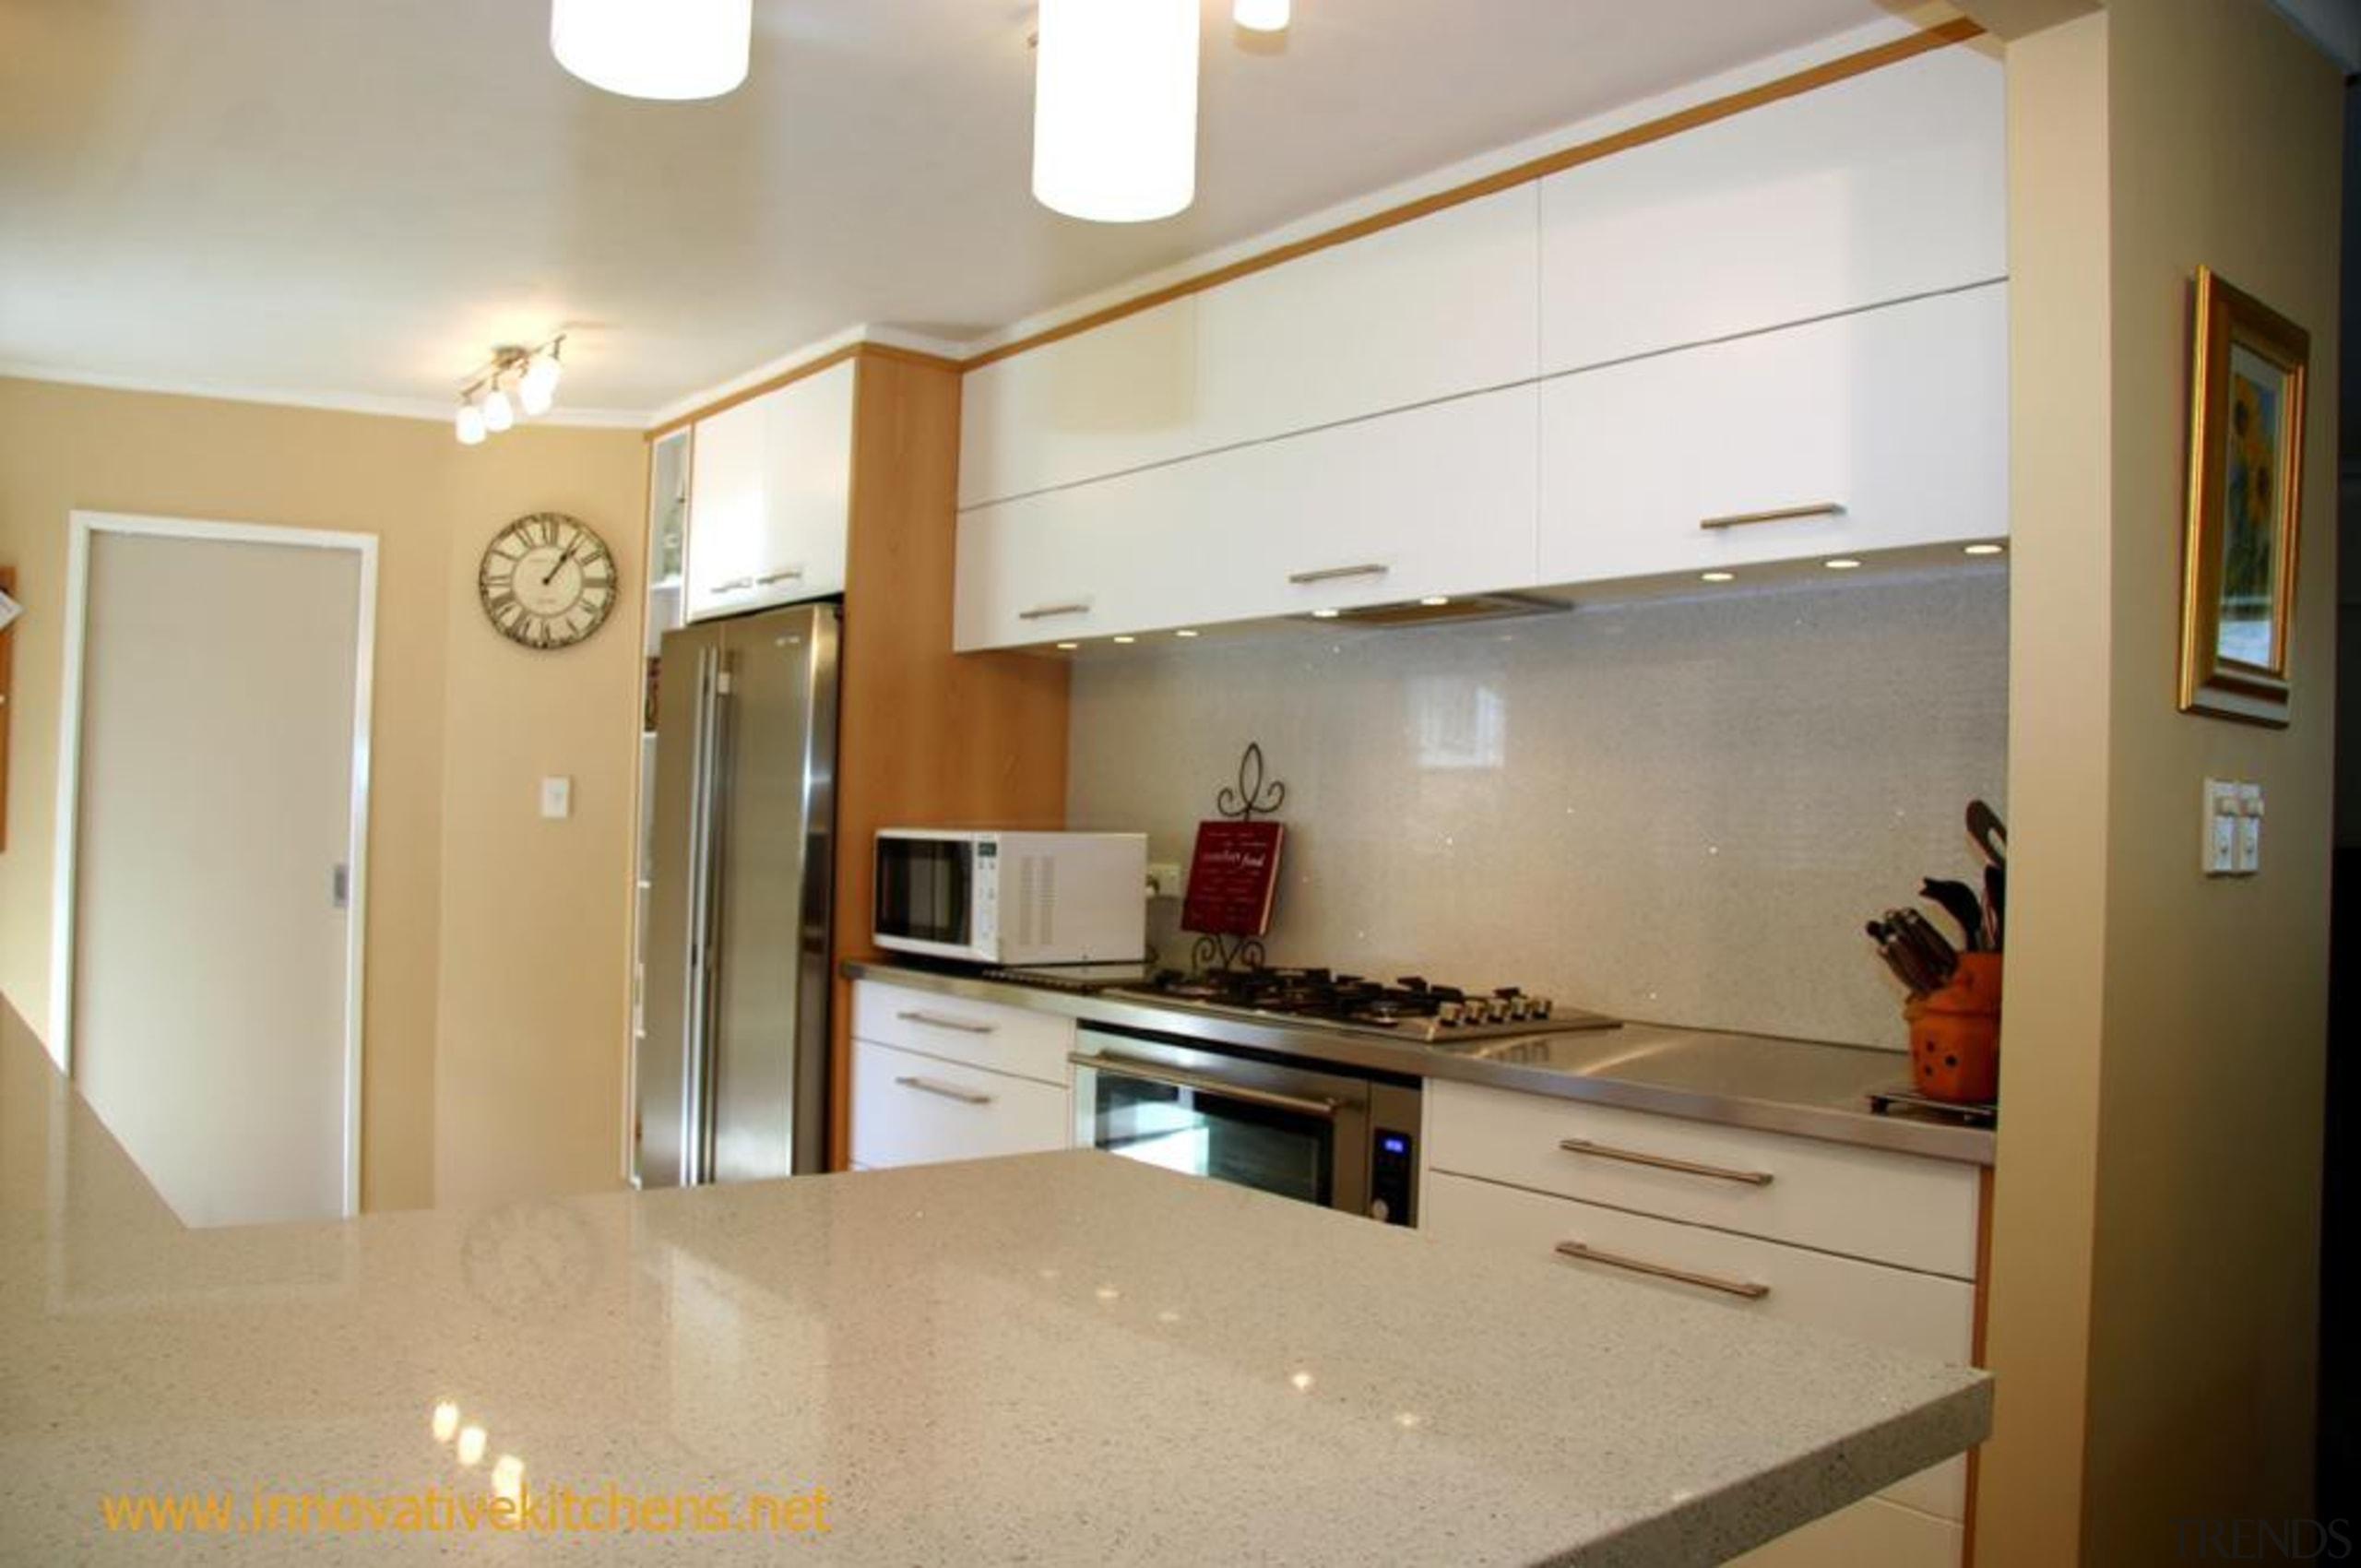 modernbirkenhead1.jpg - modernbirkenhead1.jpg - cabinetry   countertop   cabinetry, countertop, cuisine classique, floor, interior design, kitchen, property, real estate, room, gray, brown